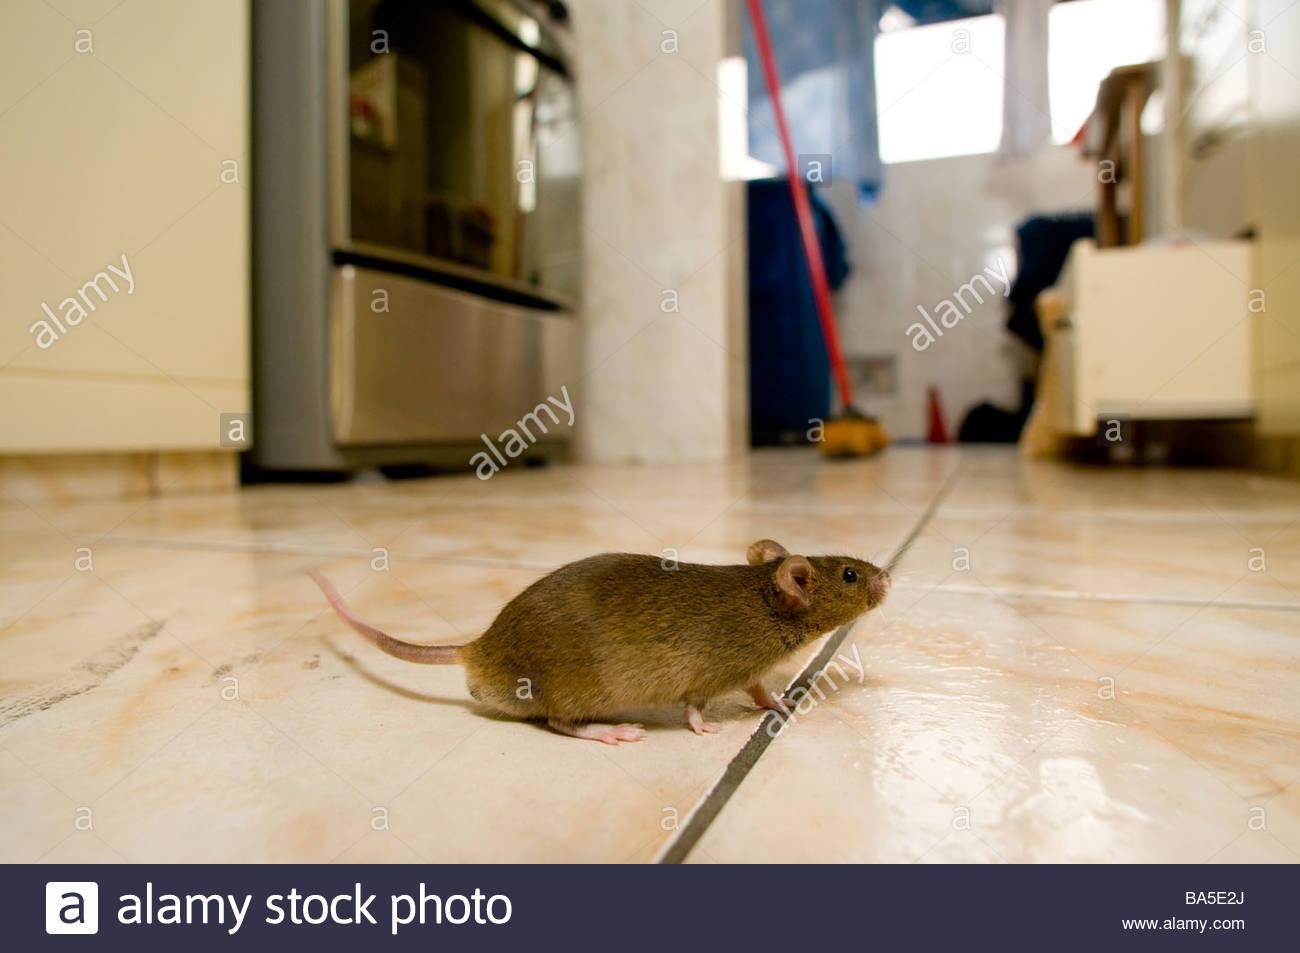 Mouse in cucina Immagini Stock